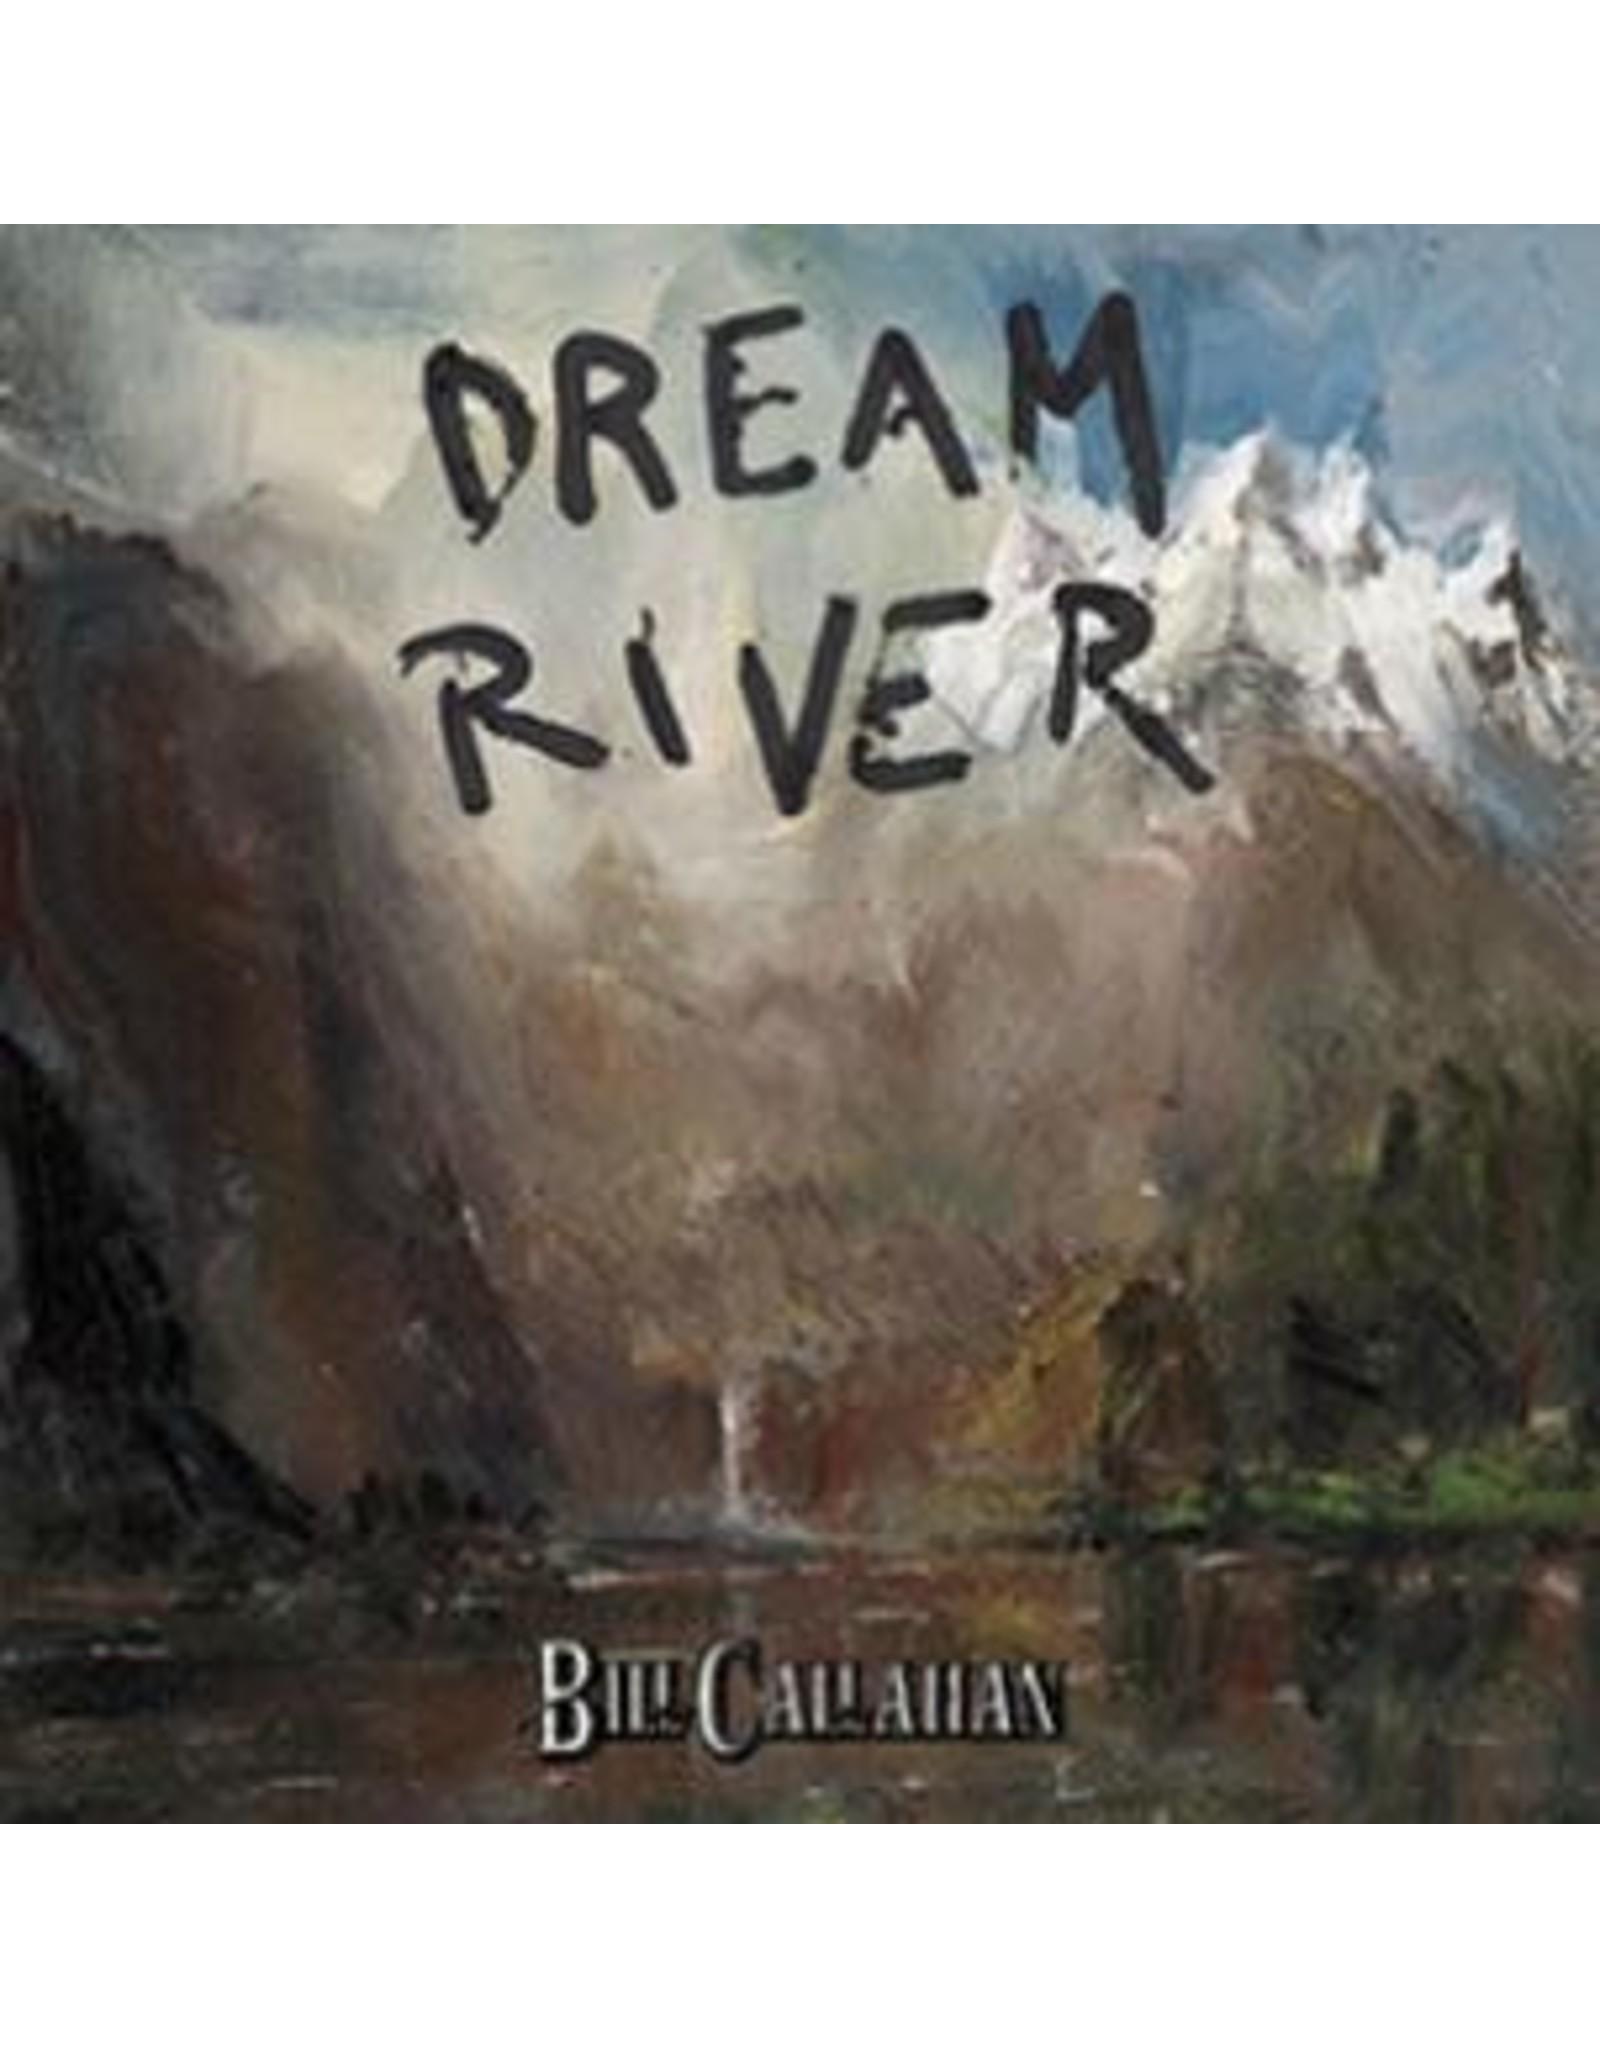 Drag City Callahan, Bill: Dream River LP